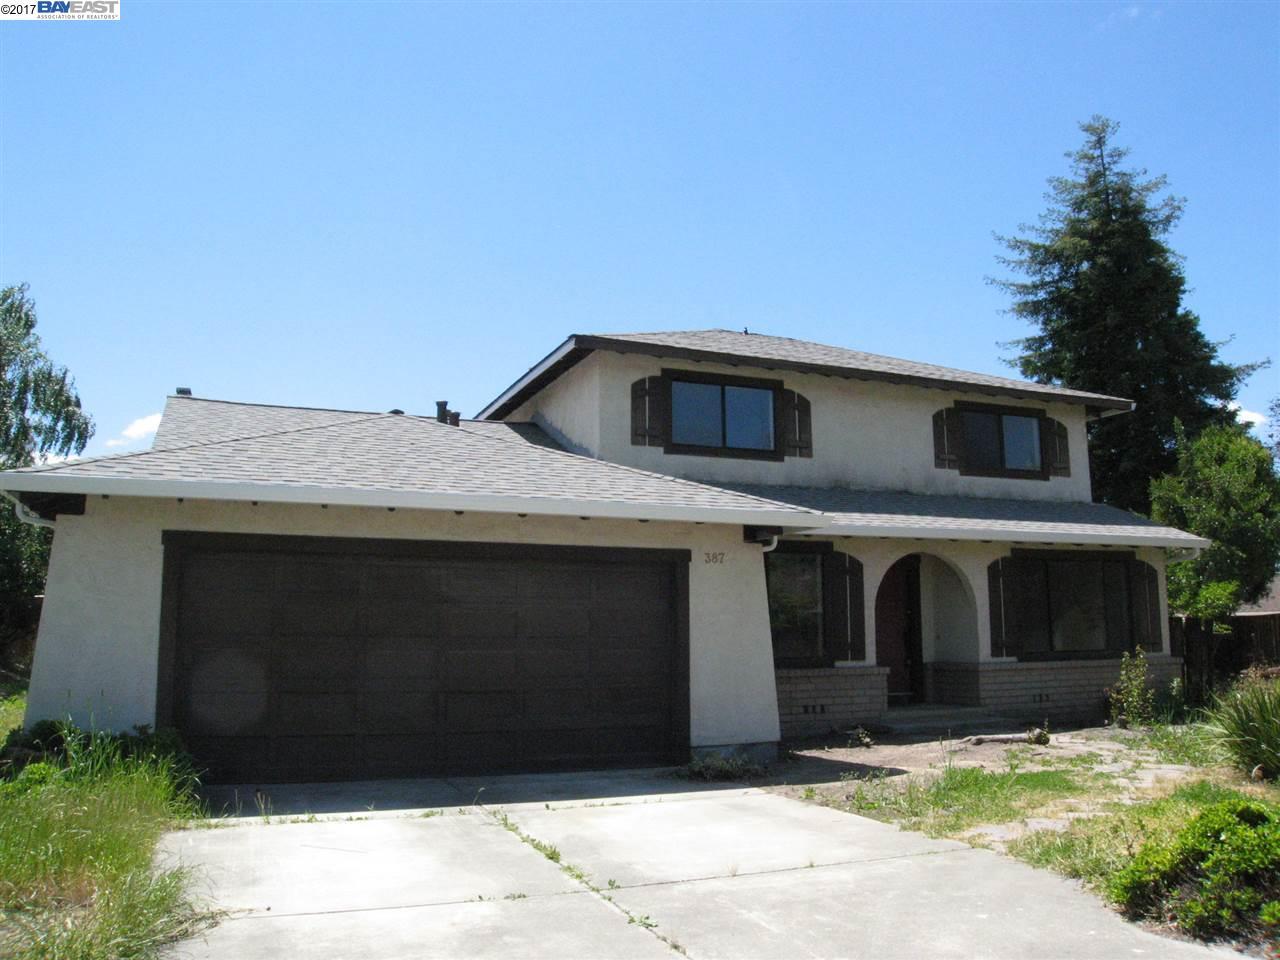 3872 Cheshire Ct, PLEASANTON, CA 94588